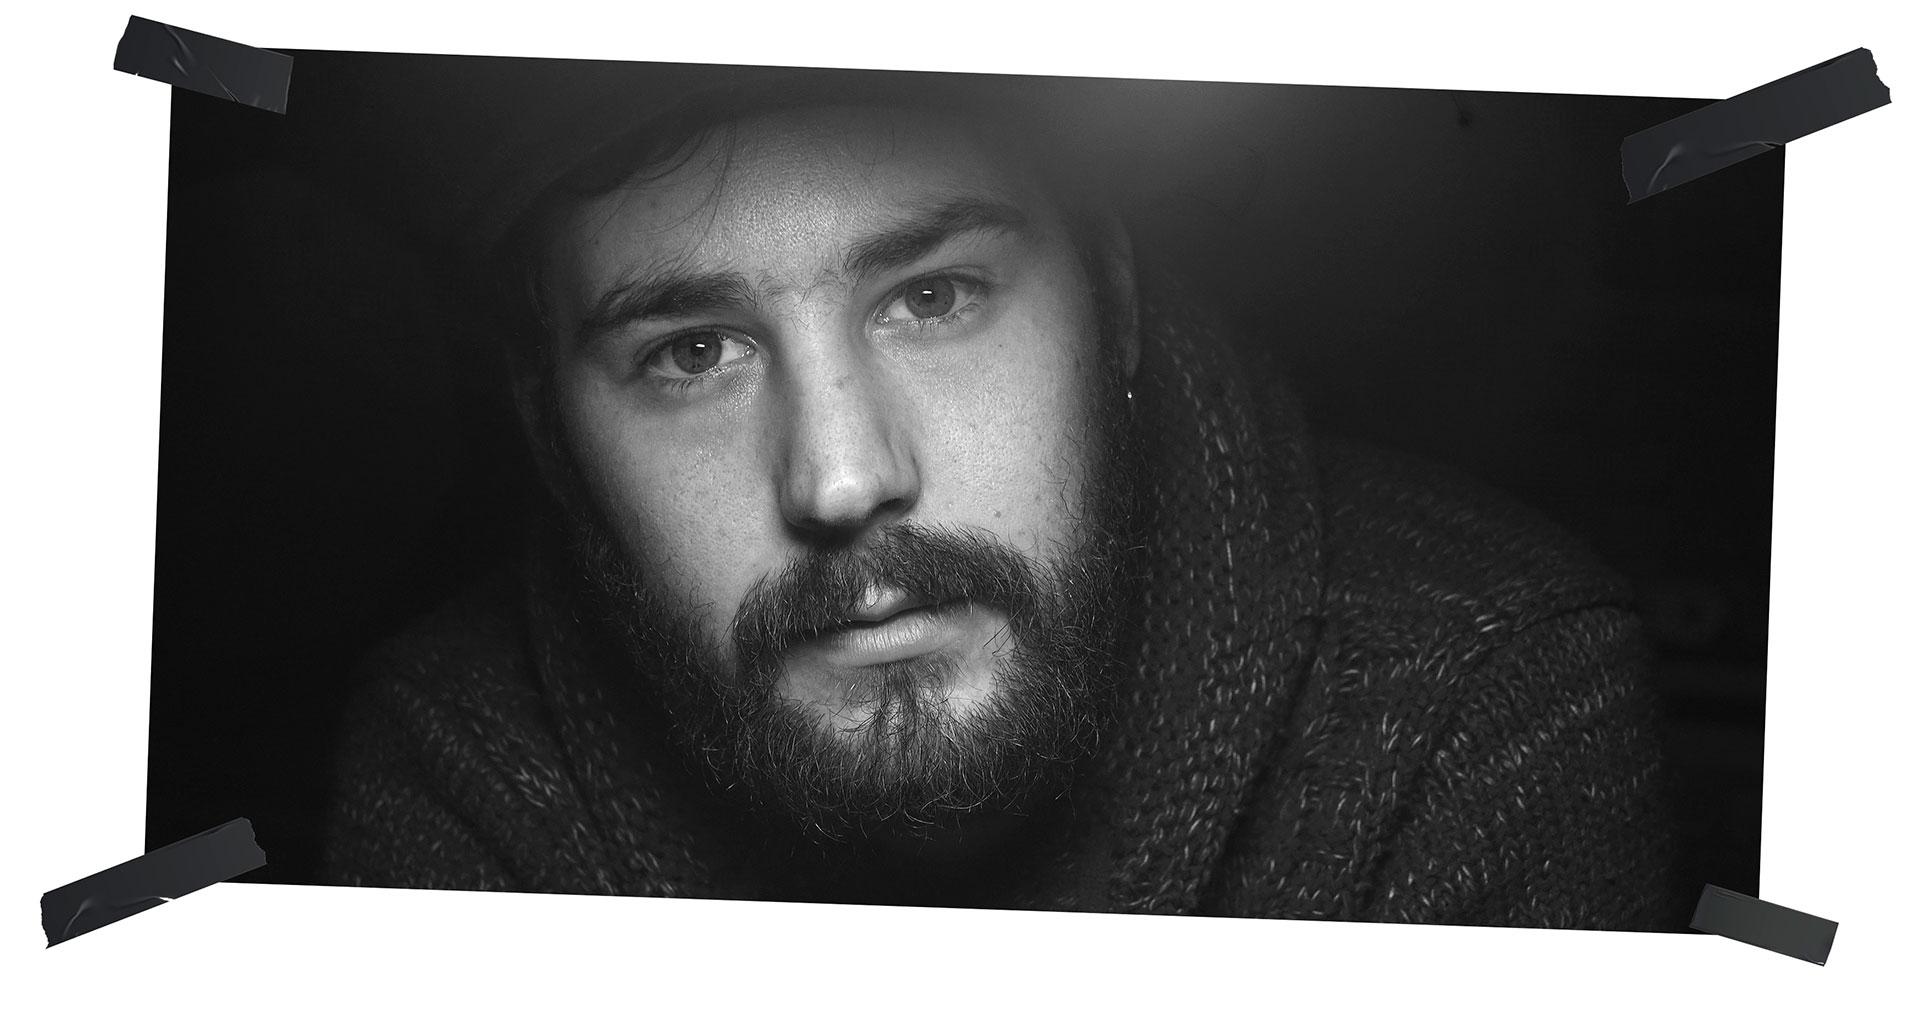 Sergio Serrano | Filmmaker